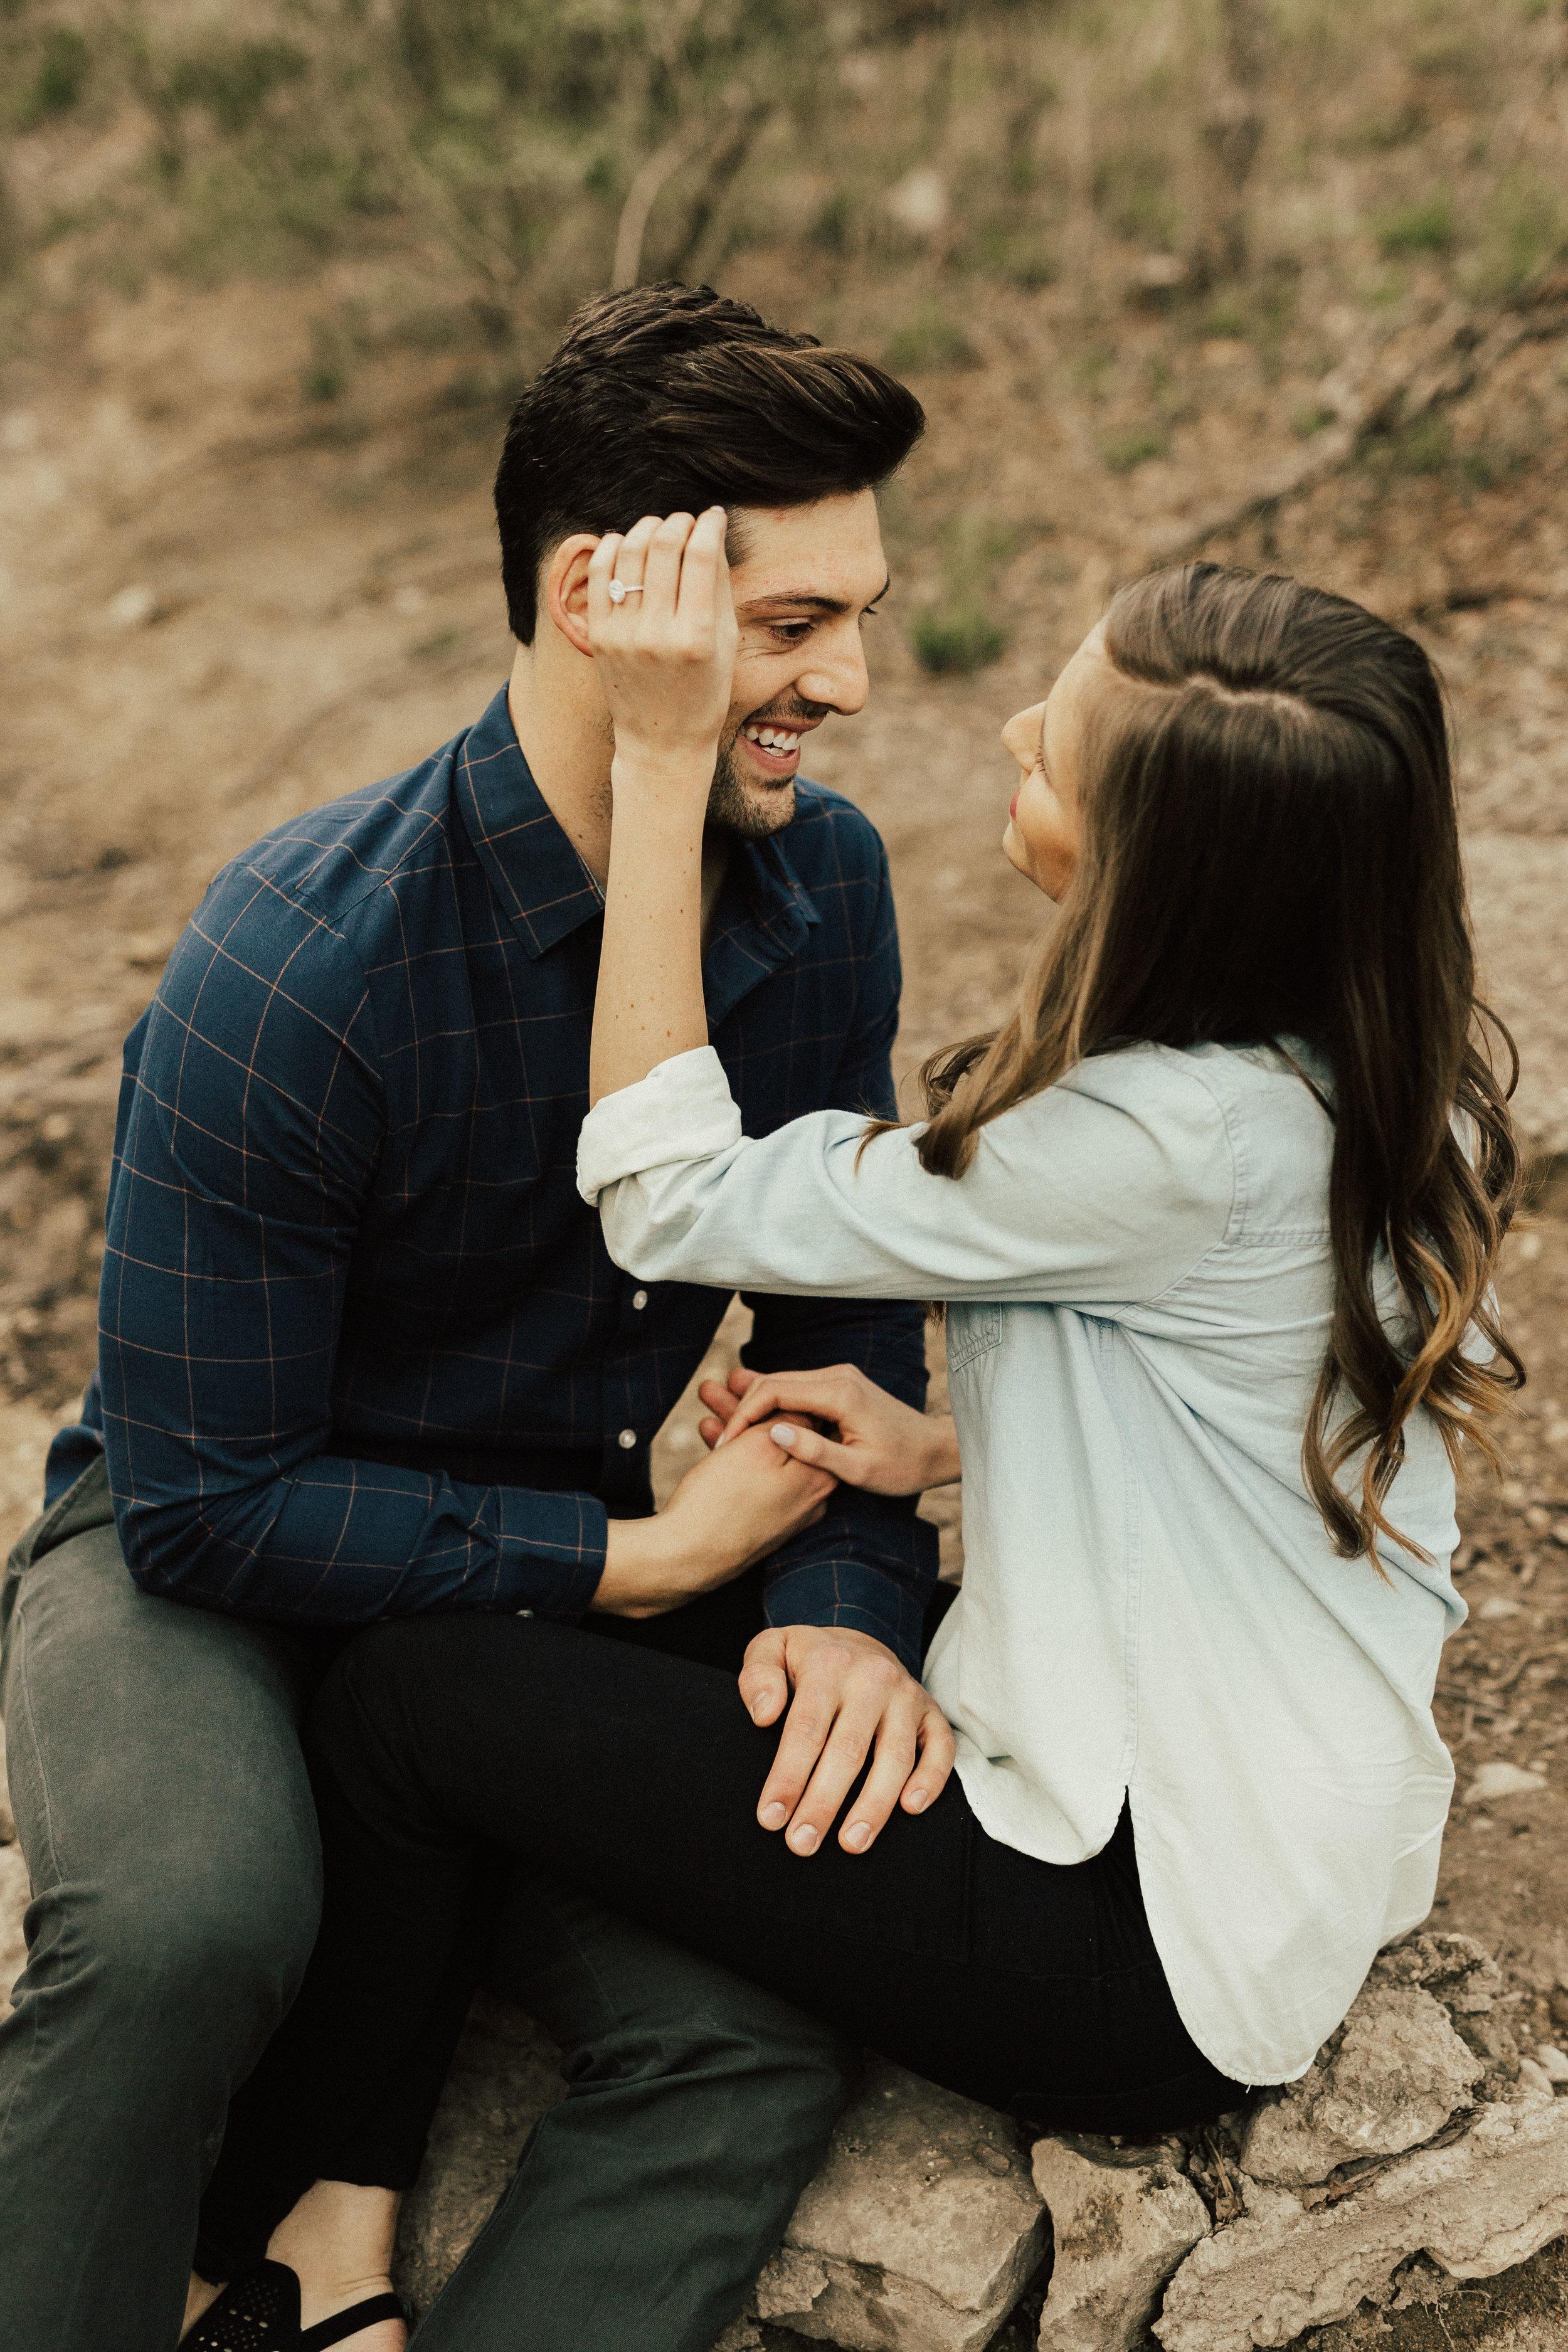 Morgan -Christian-Engagements-Austin-texas-skyline-Emma-Long-Metropolitan-Park-texas-photographer-22